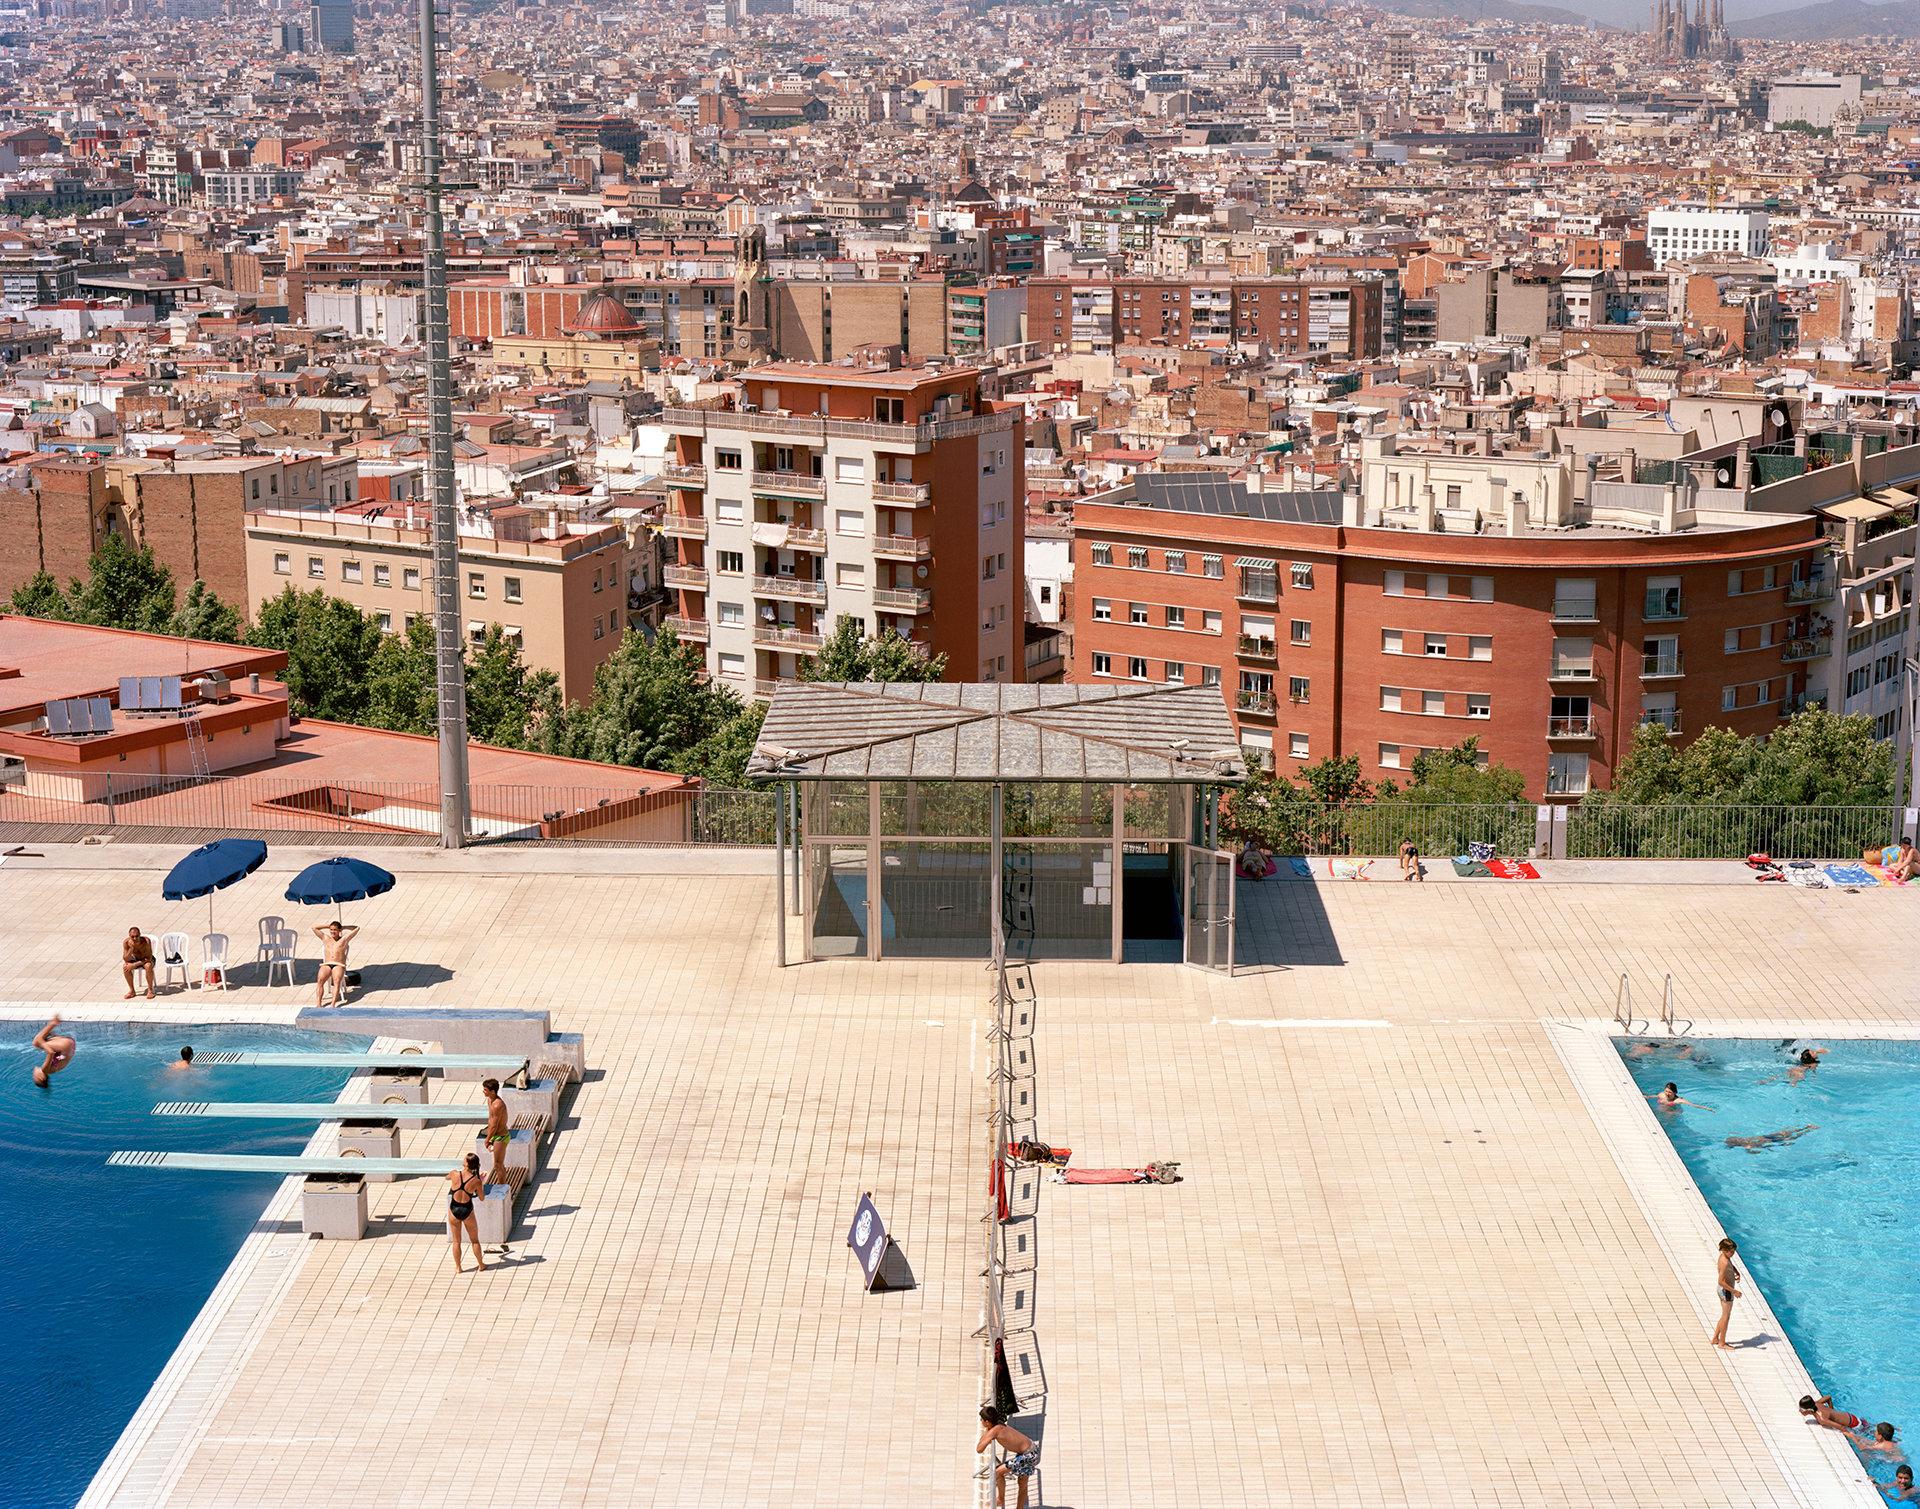 barcelonapool.jpg